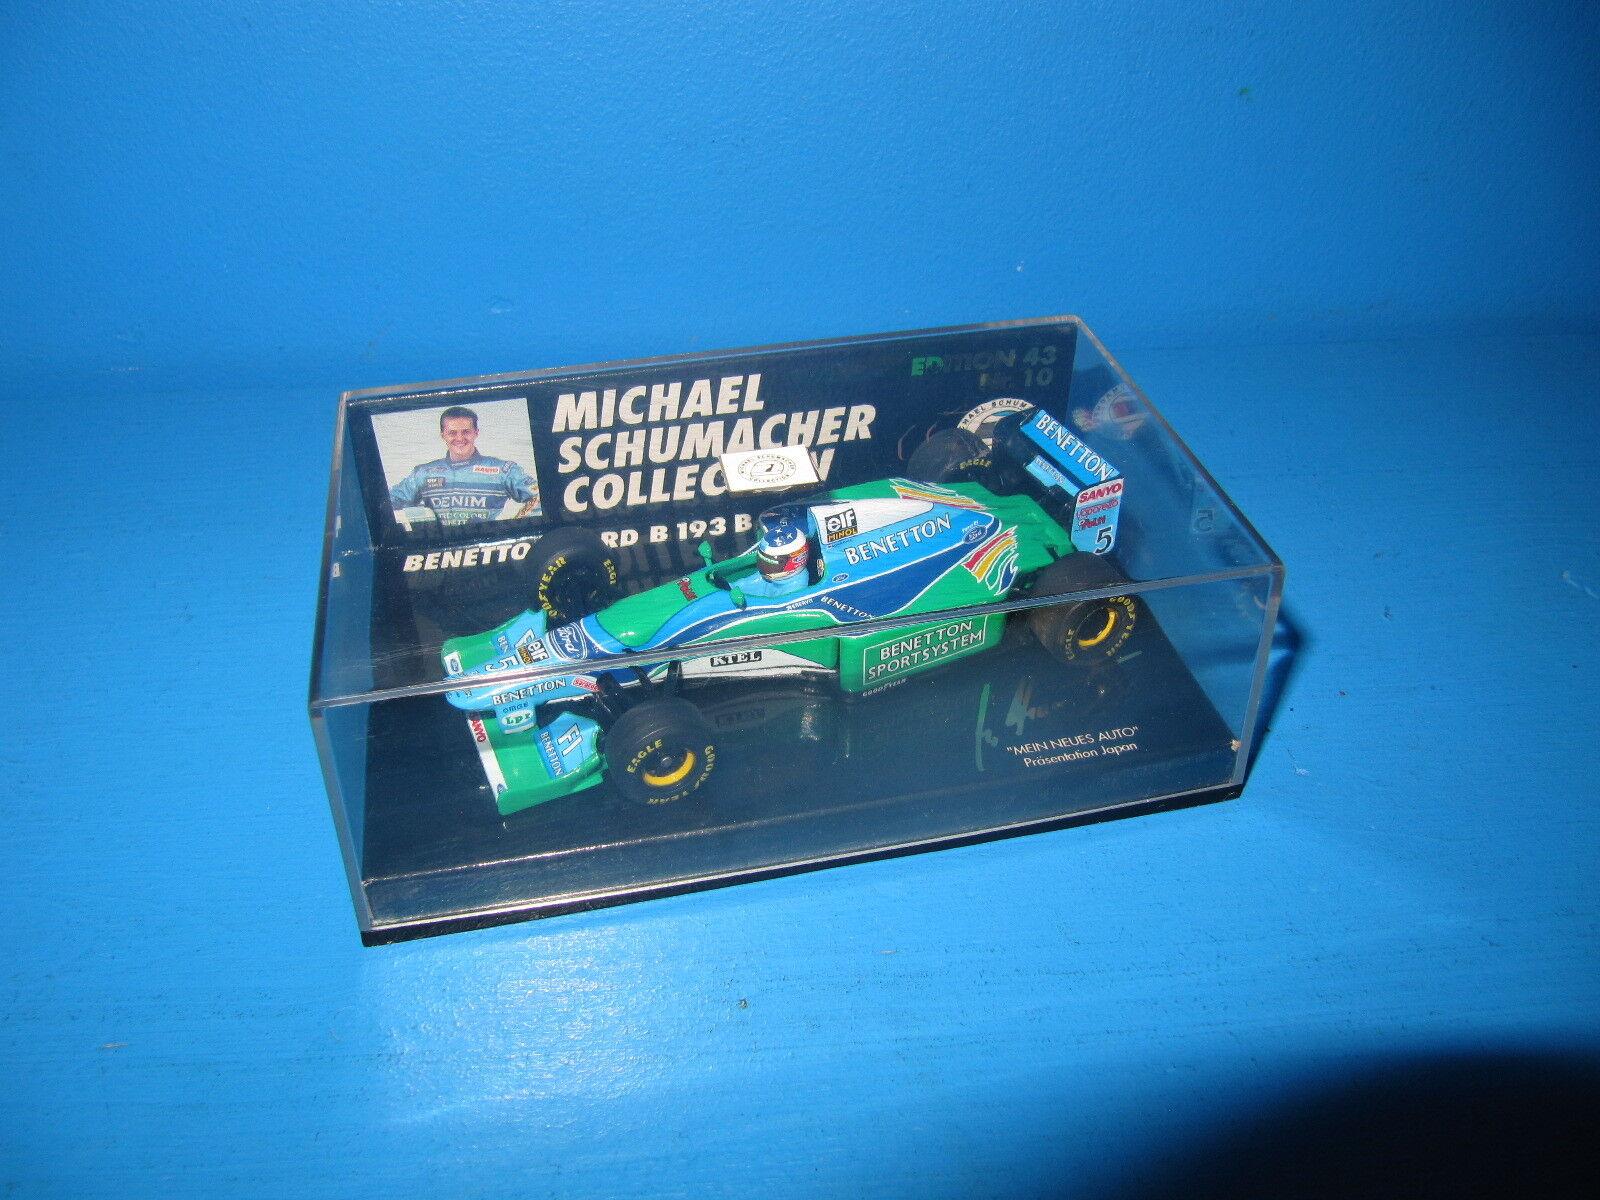 Pauls model type 1 43 Benetton f1 b193b M. Schumacher Japon 94 no10 Top à NEUF dans sa boîte